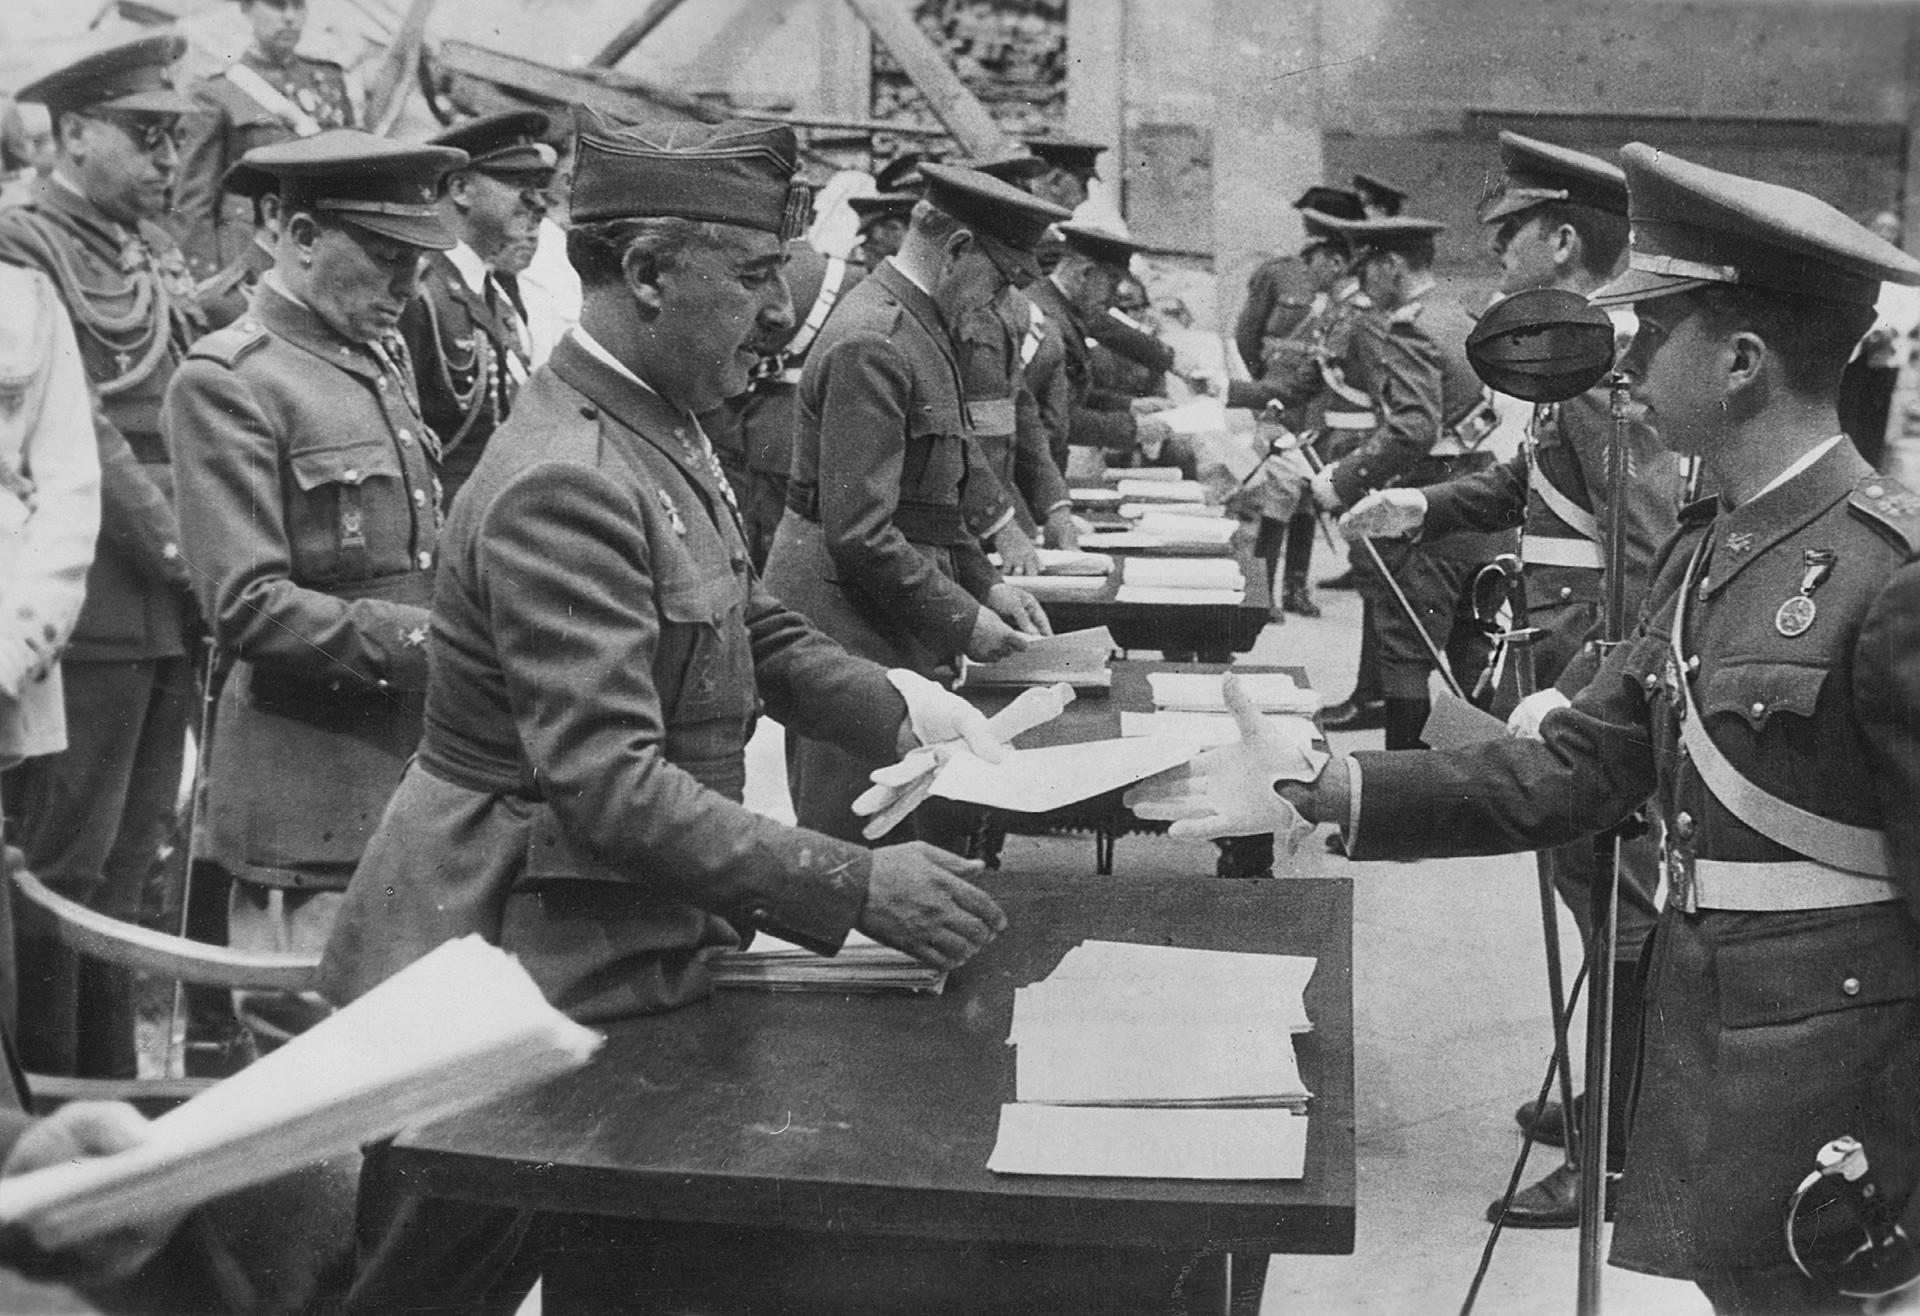 Francesco Franco incontra i suoi ufficiali